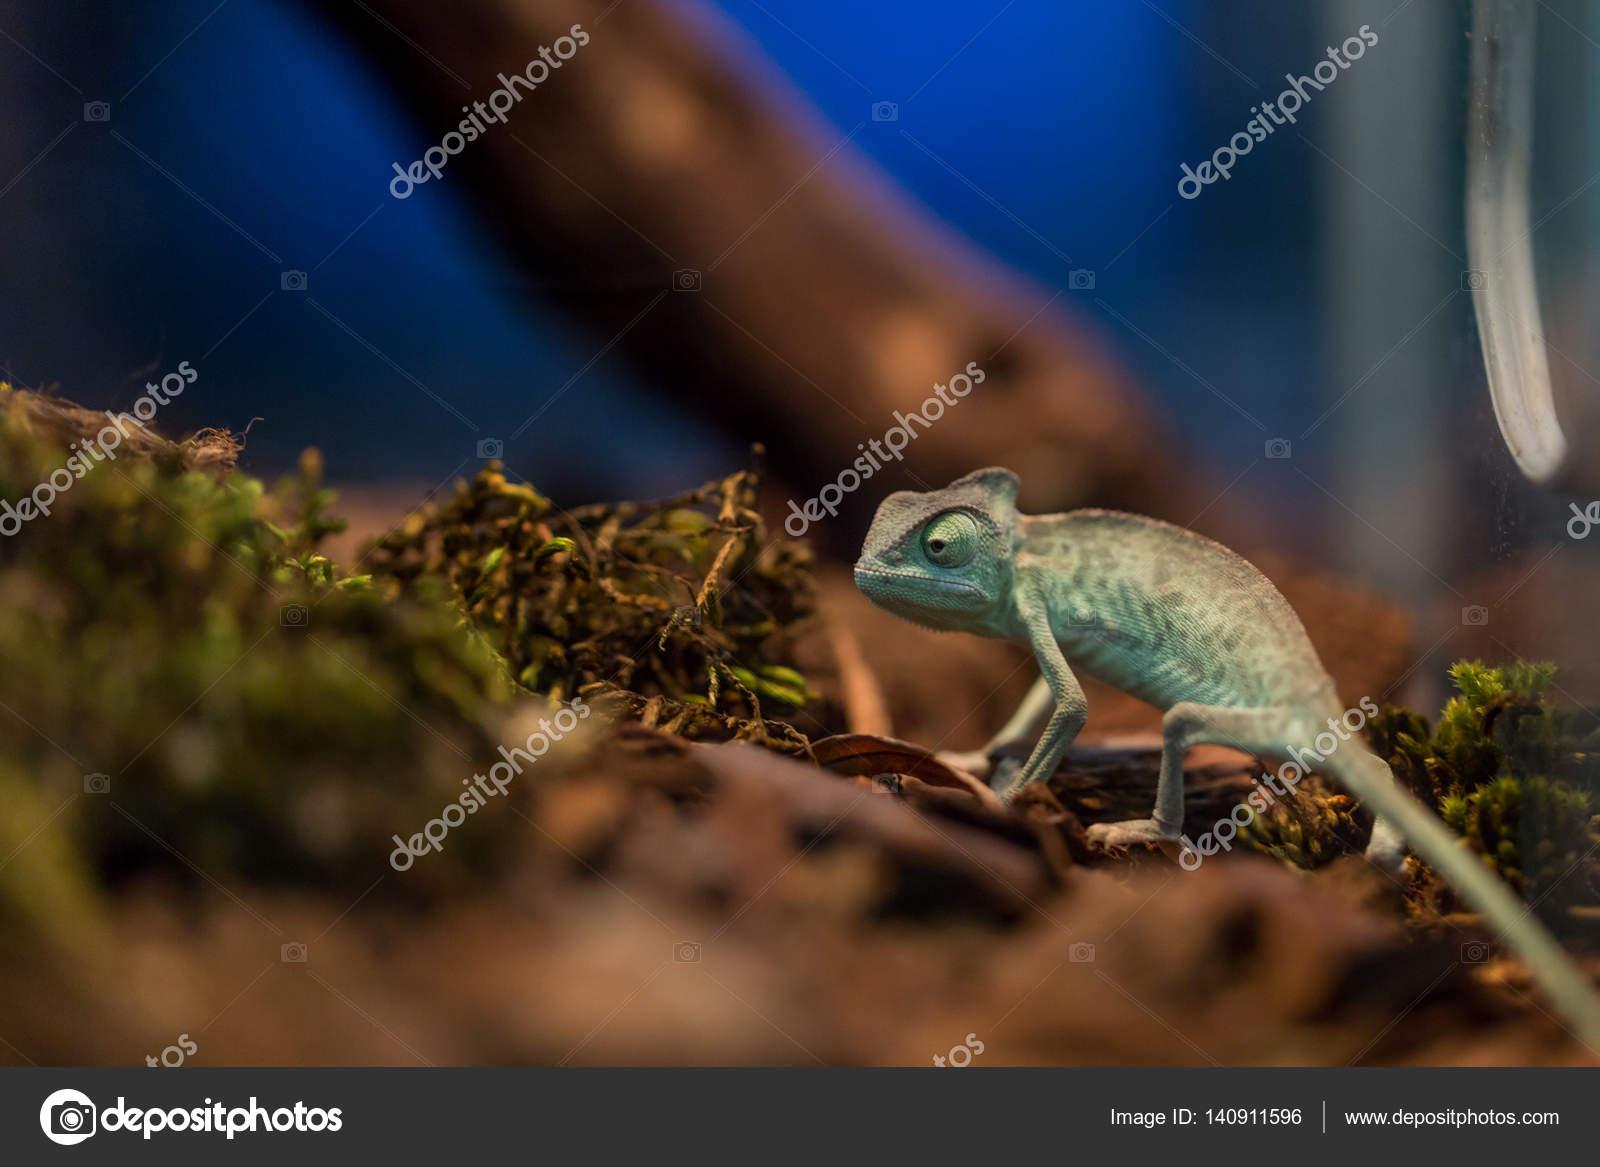 Small Lizard In Terrarium For Home Decor Stock Photo C Sytnik